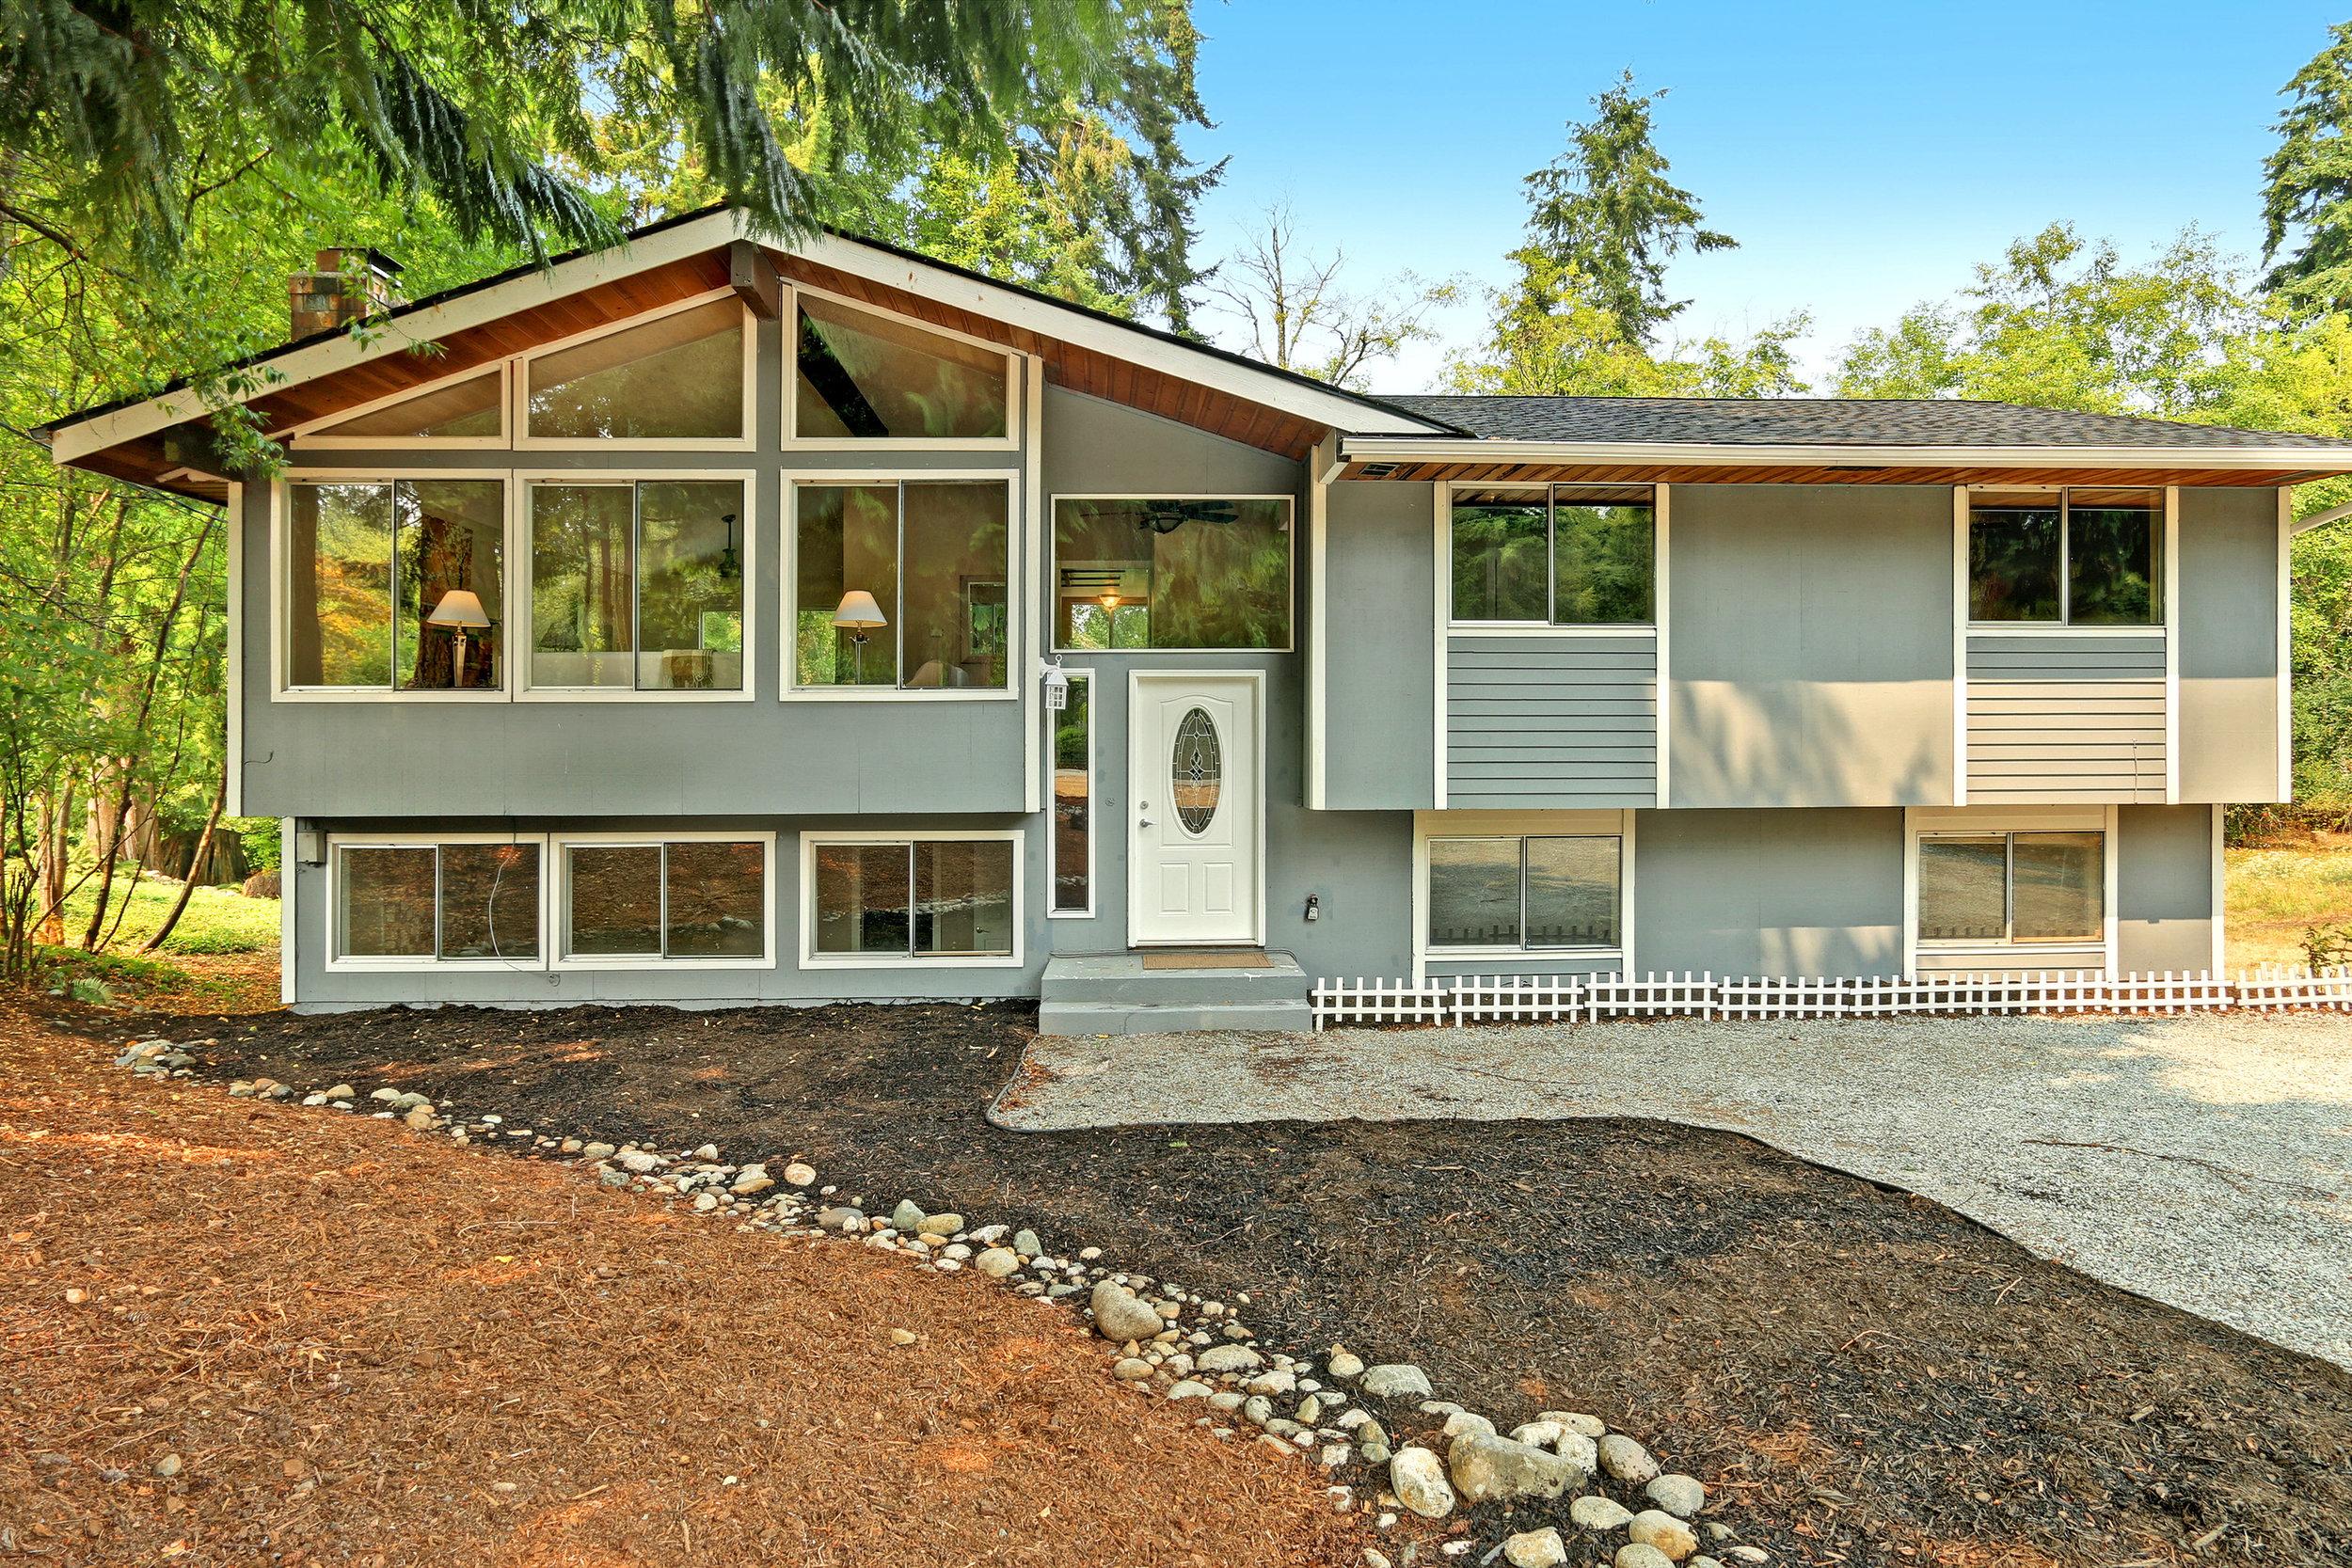 Lake Howard Home - 17820 64th Dr NW, Stanwood, WA 98292